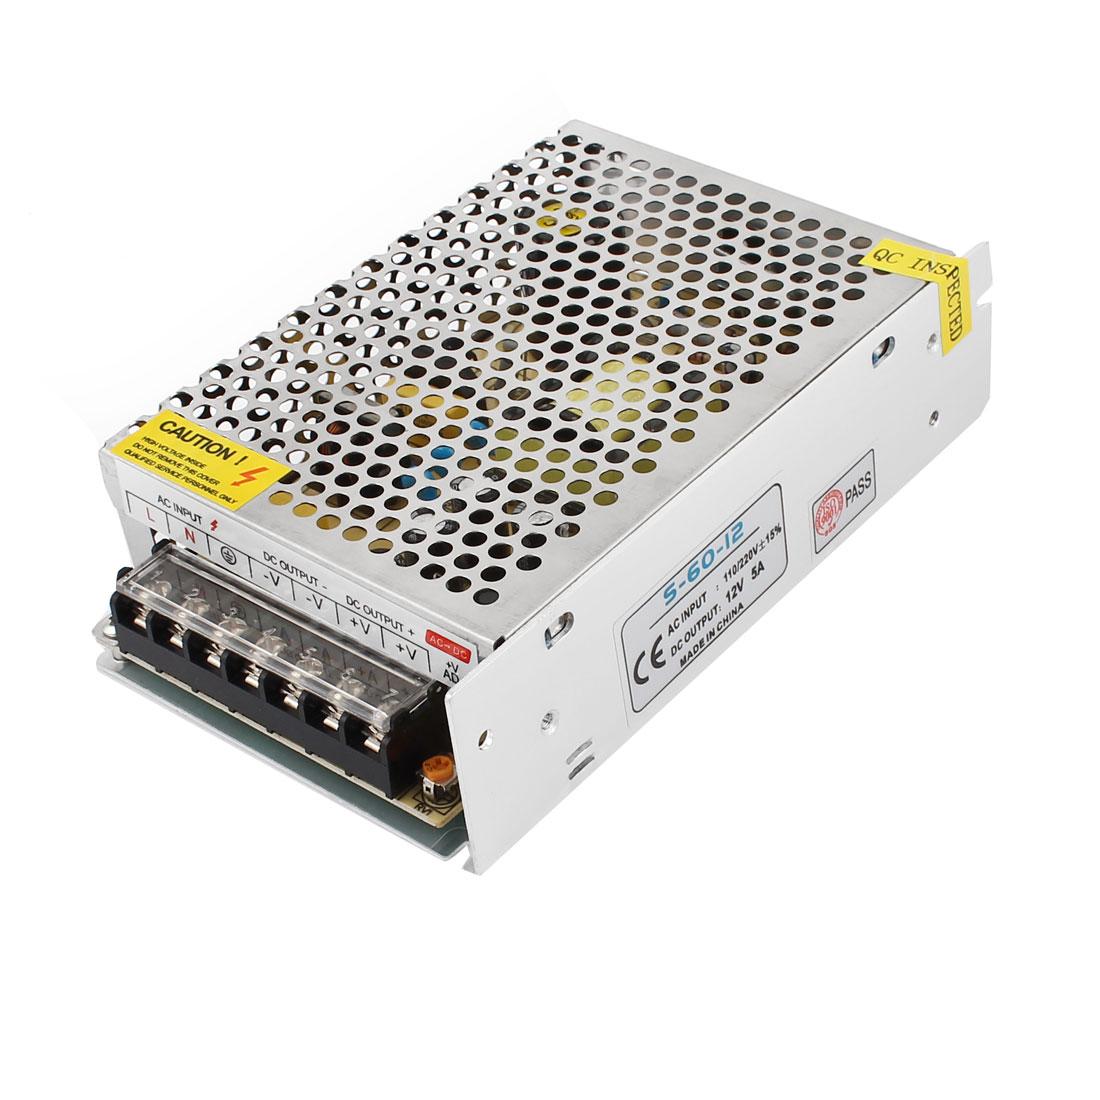 AC 110V-220V DC 12V 5A 60W Metal Housing Switching Power Supply Converter